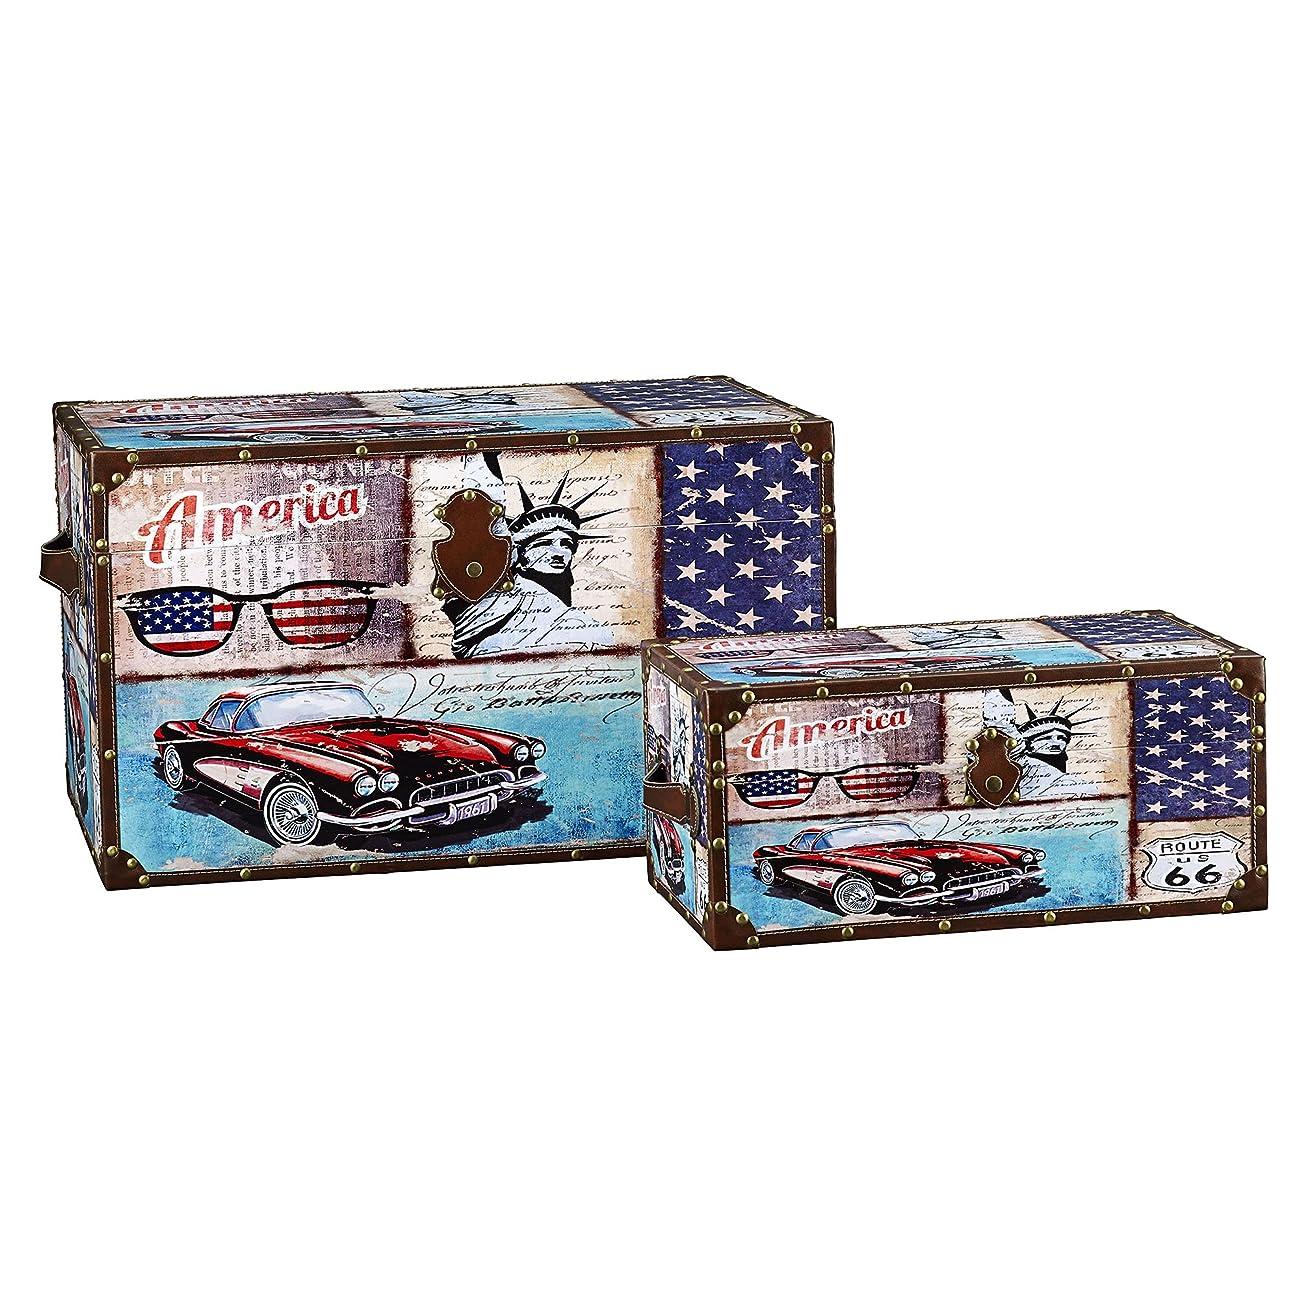 Household Essentials Decorative Storage Trunk, Classic Americana Vintage Car Design, Set of 2 0